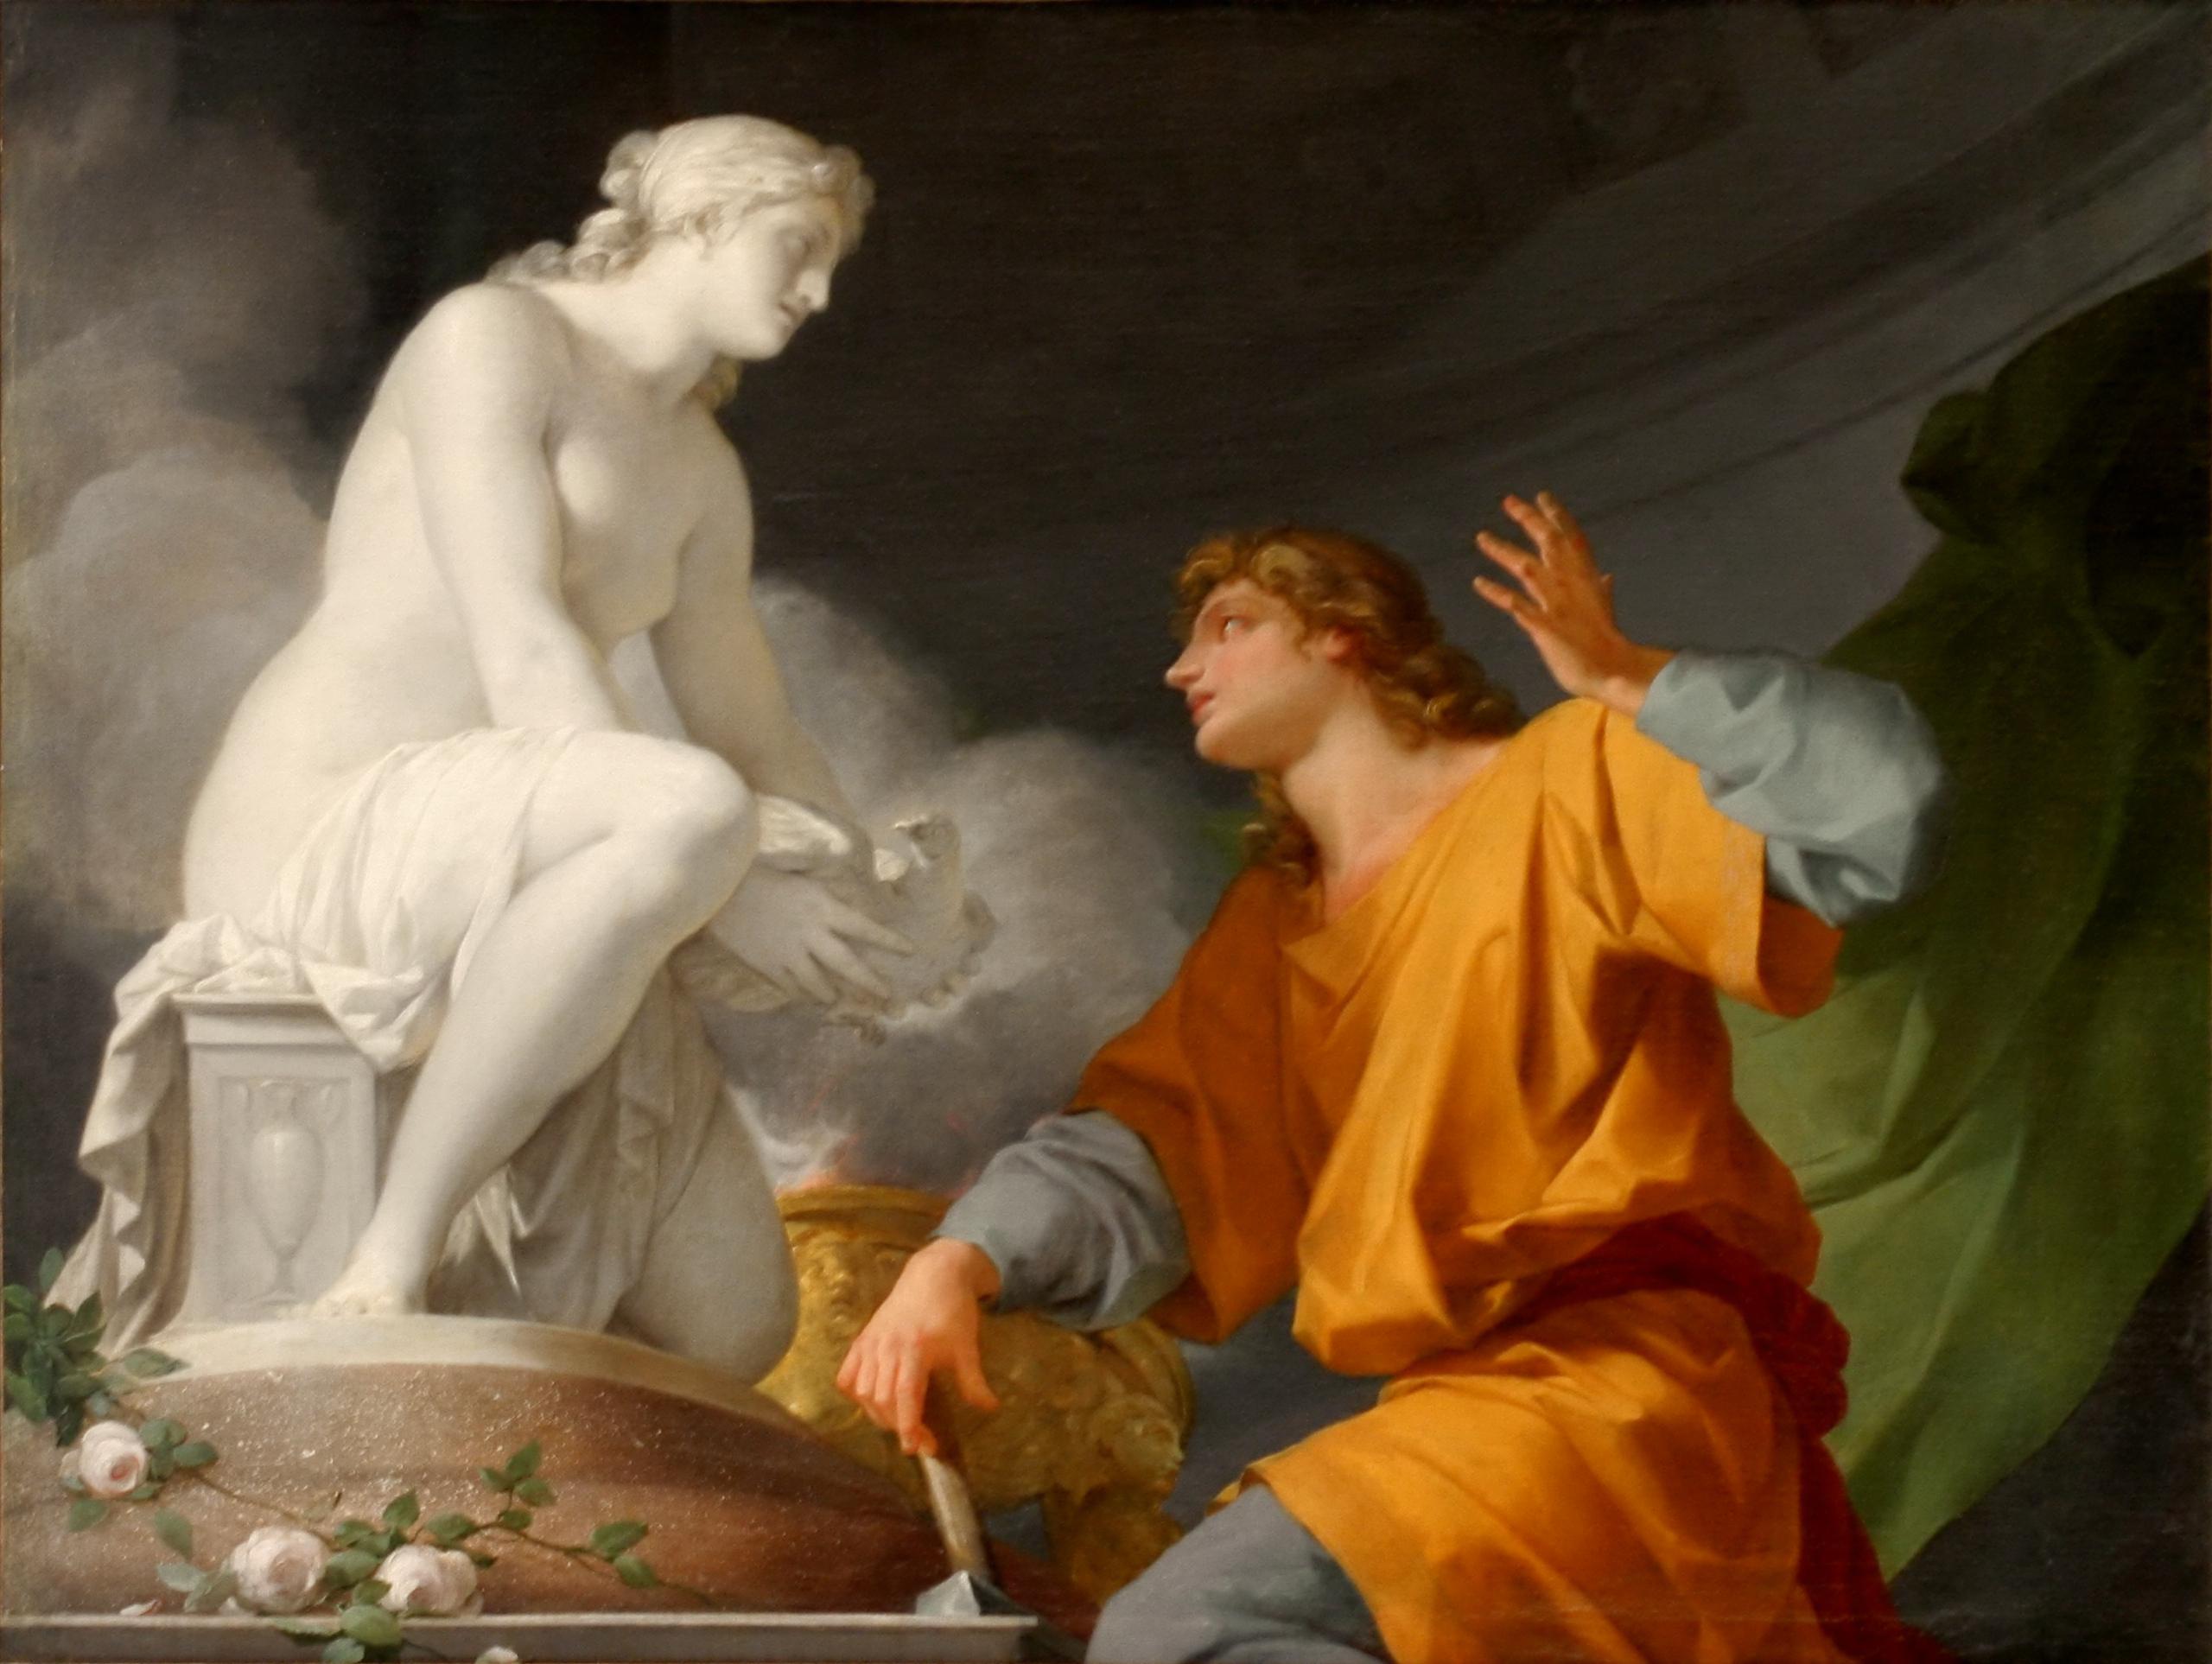 https://upload.wikimedia.org/wikipedia/commons/8/84/Ch%C3%A2teau_de_Versailles,_salon_des_nobles,_Pygmalion_priant_V%C3%A9nus_d'animer_sa_statue,_Jean-Baptiste_Regnault.jpg